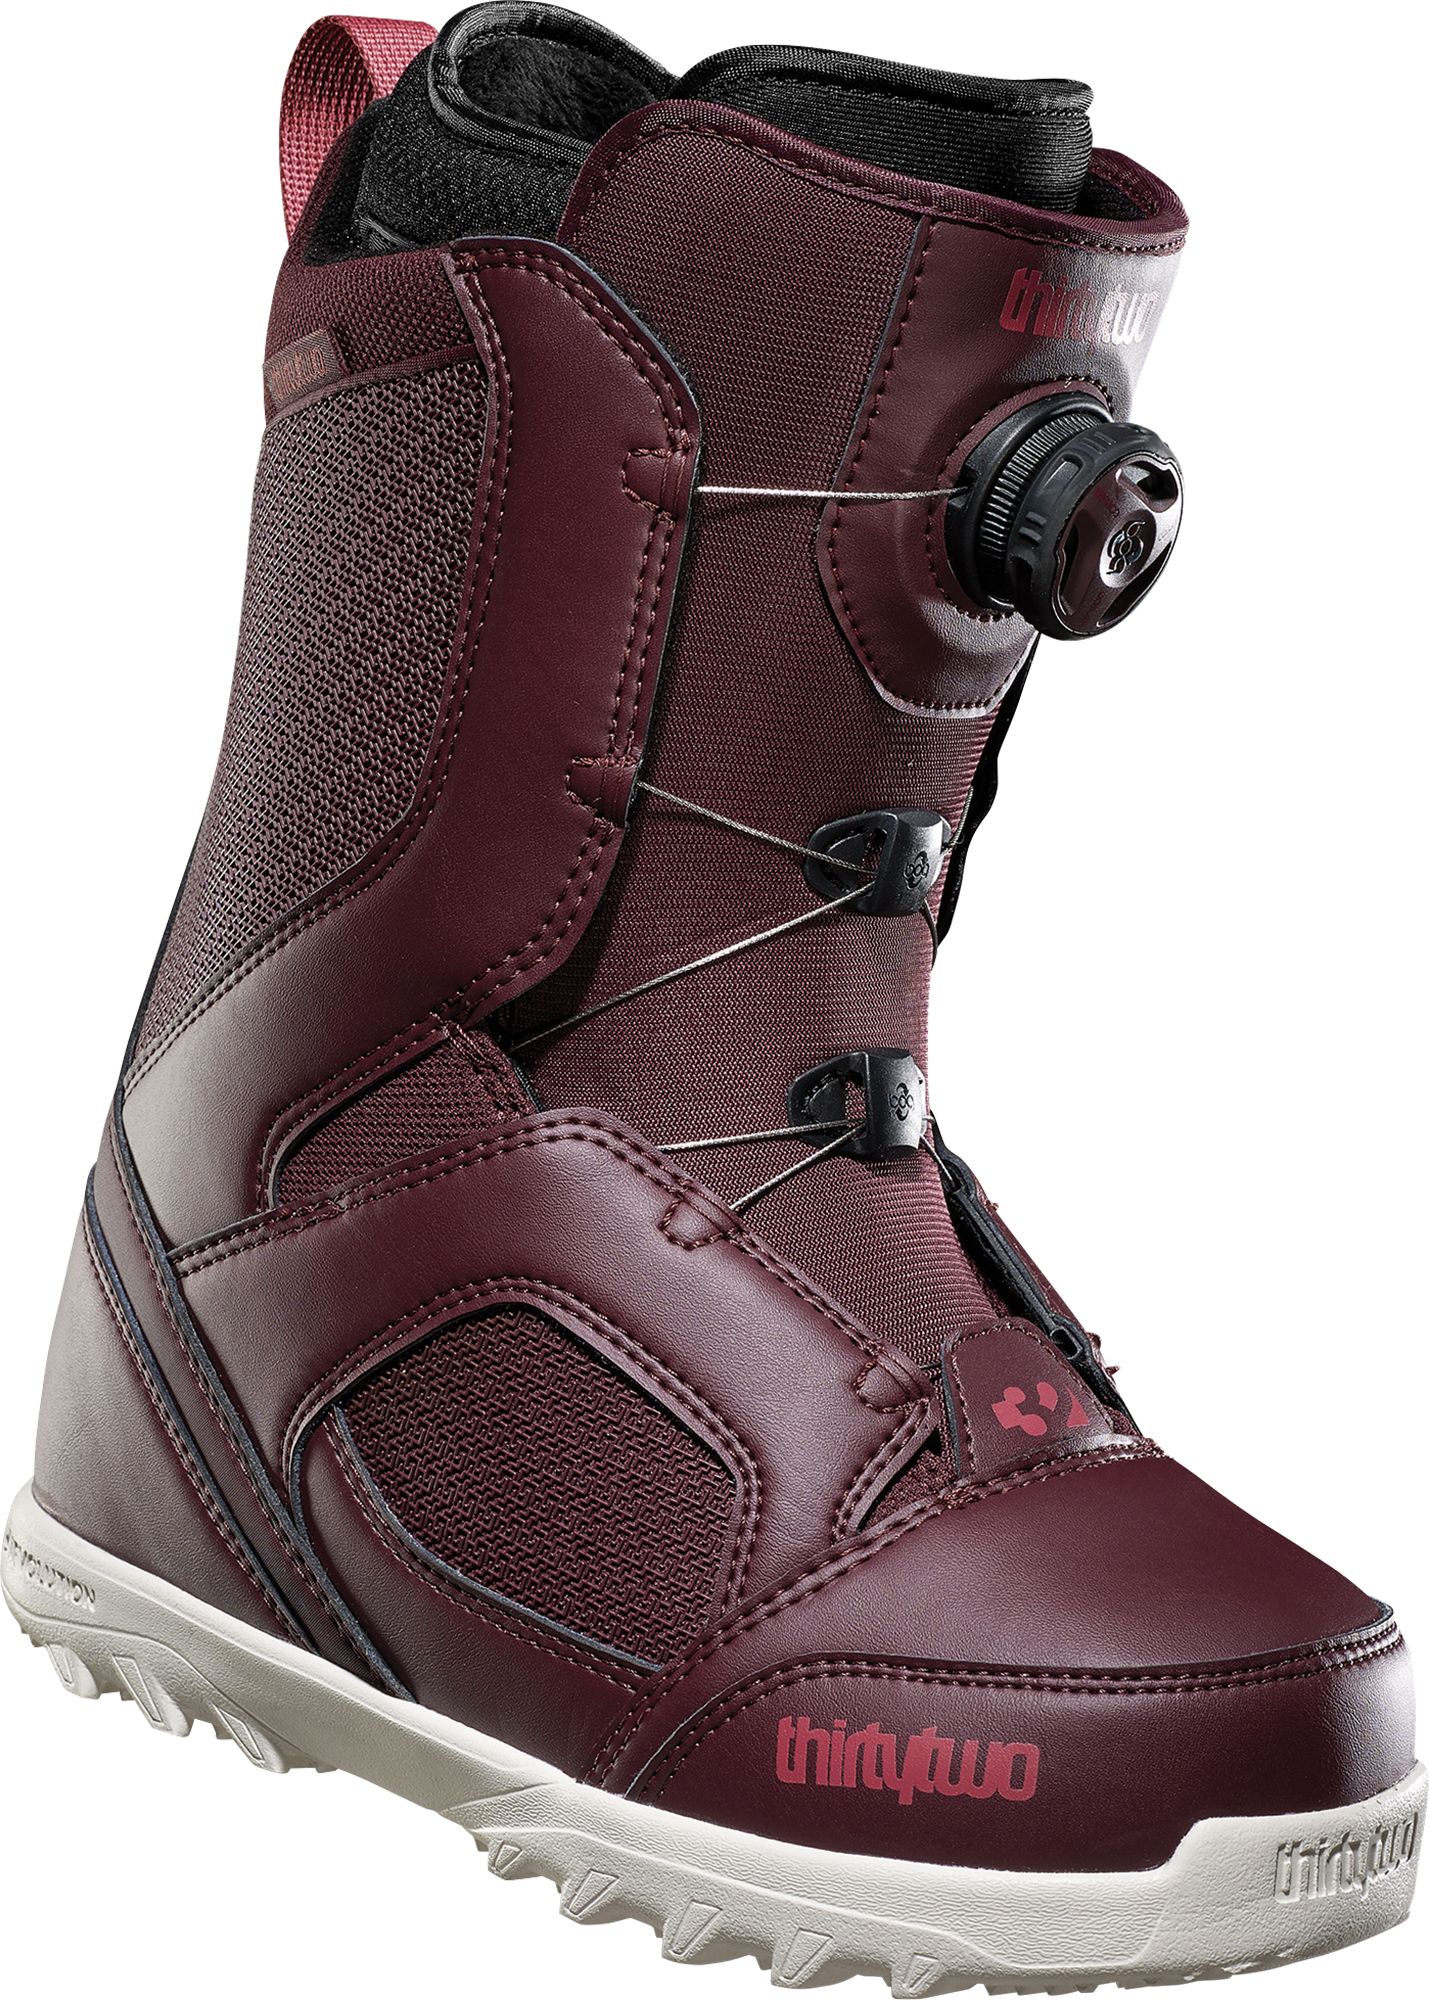 ThirtyTwo Сноубордические ботинки женские Stw Boa 18, размер 39